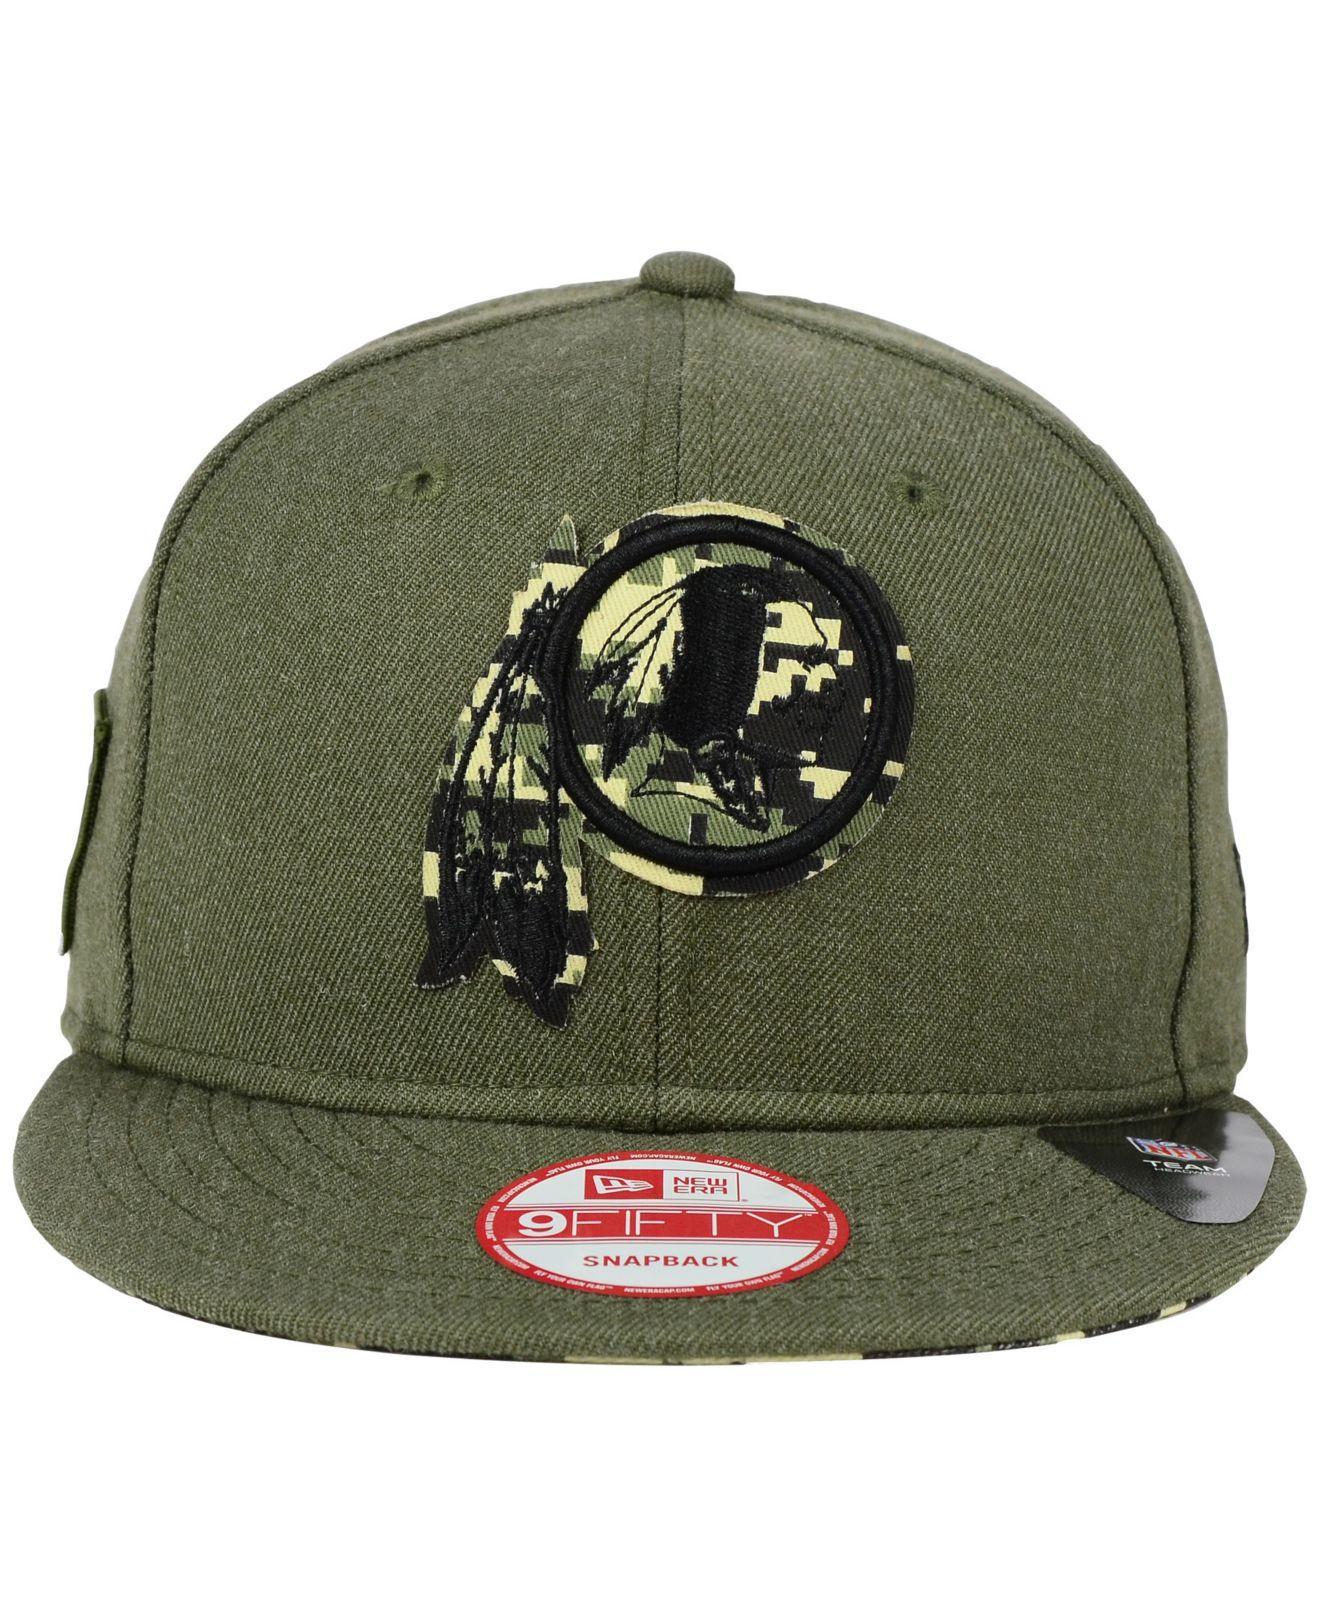 fdc6d58c6fe Lyst - KTZ Washington Redskins Camo 9fifty Snapback Cap in Green for Men